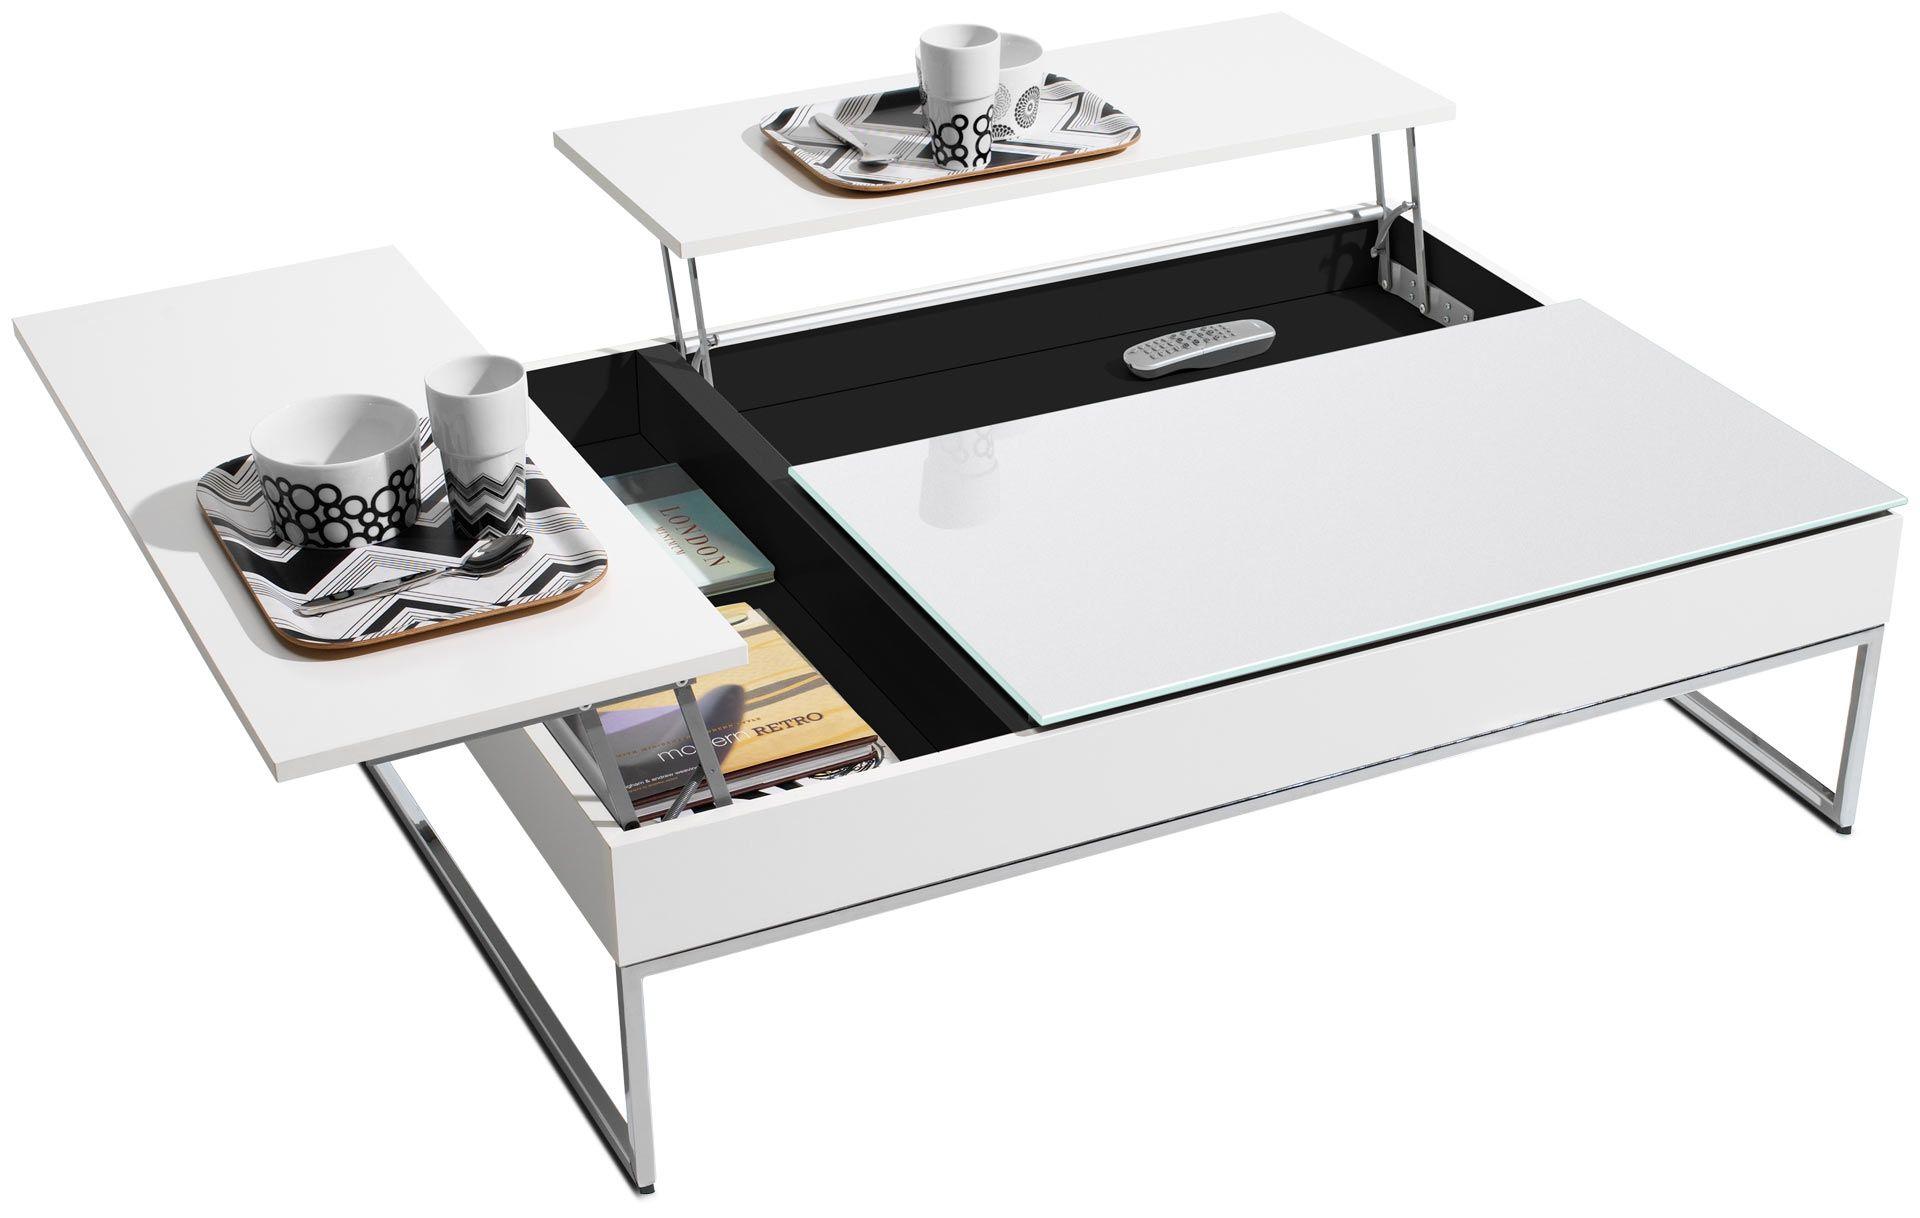 Tables basse BoConcept Meuble table rabattable